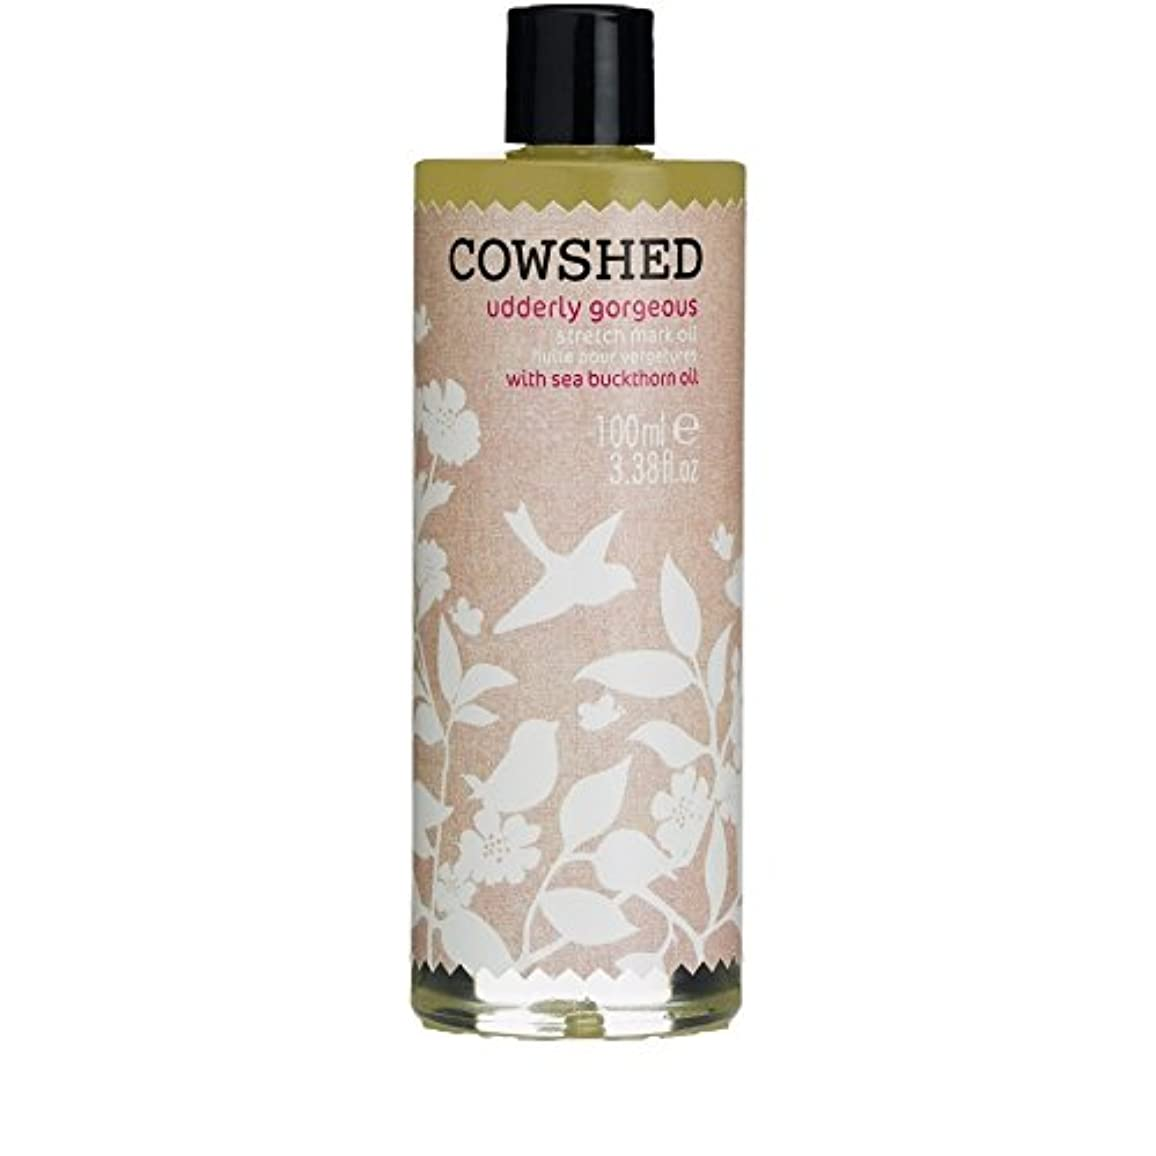 Cowshed Udderly Gorgeous Stretch Mark Oil 100ml - 牛舎ゴージャスなストレッチマークオイル100ミリリットル [並行輸入品]